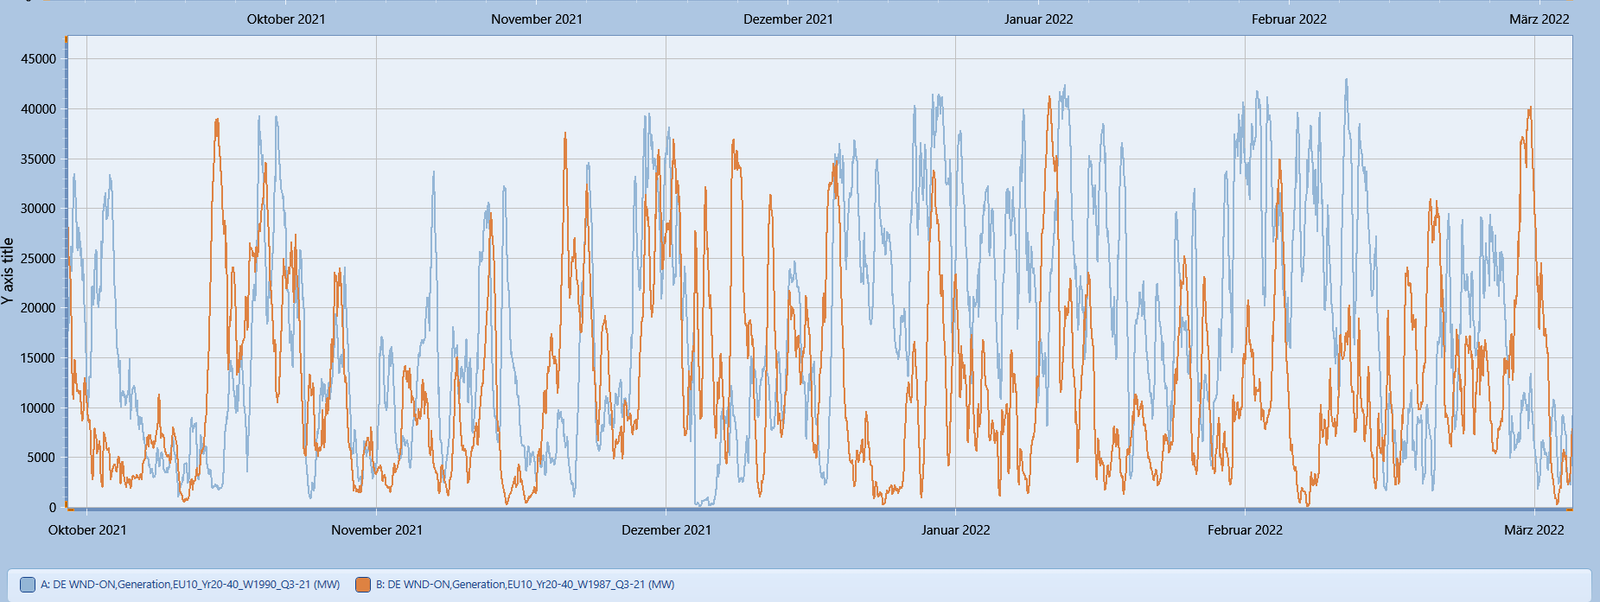 Power market winter 2021 2022 fuels wind onshore